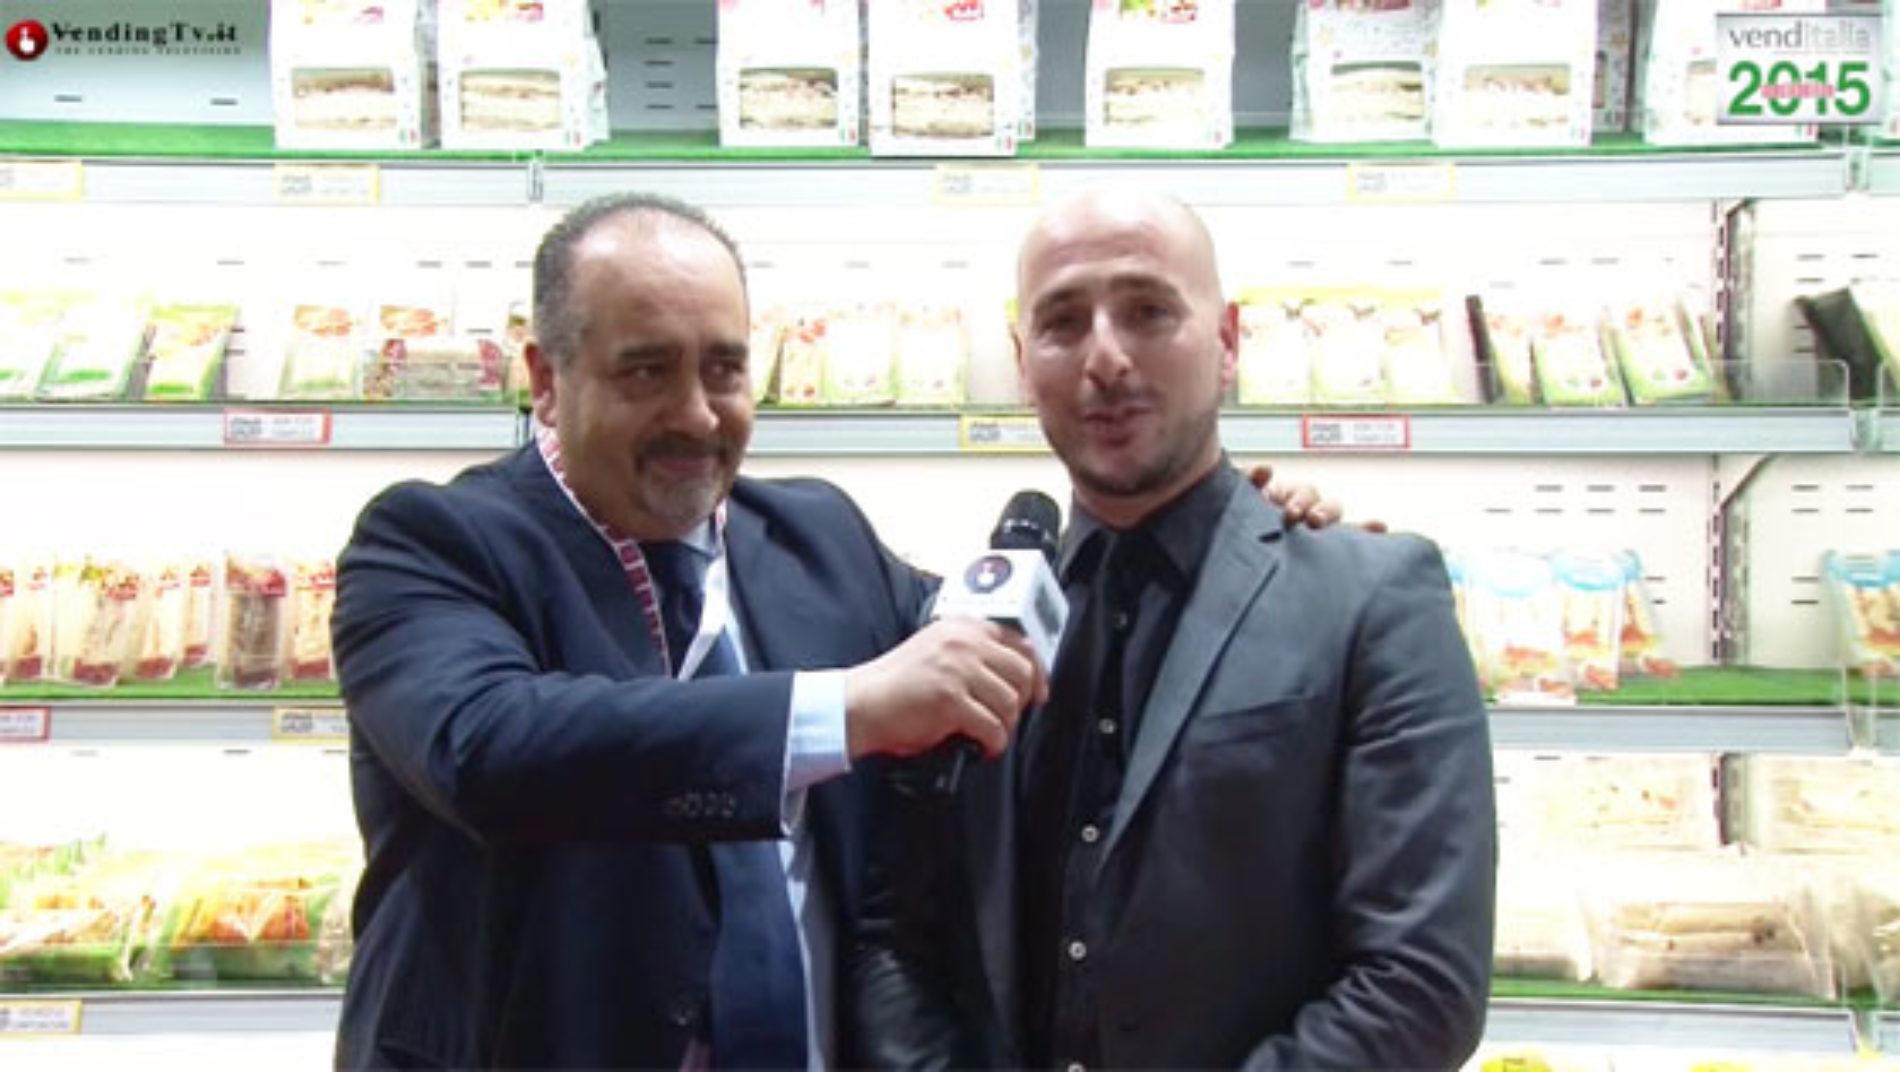 Vending Tv – Intervista con Luca Pastore di AdueA